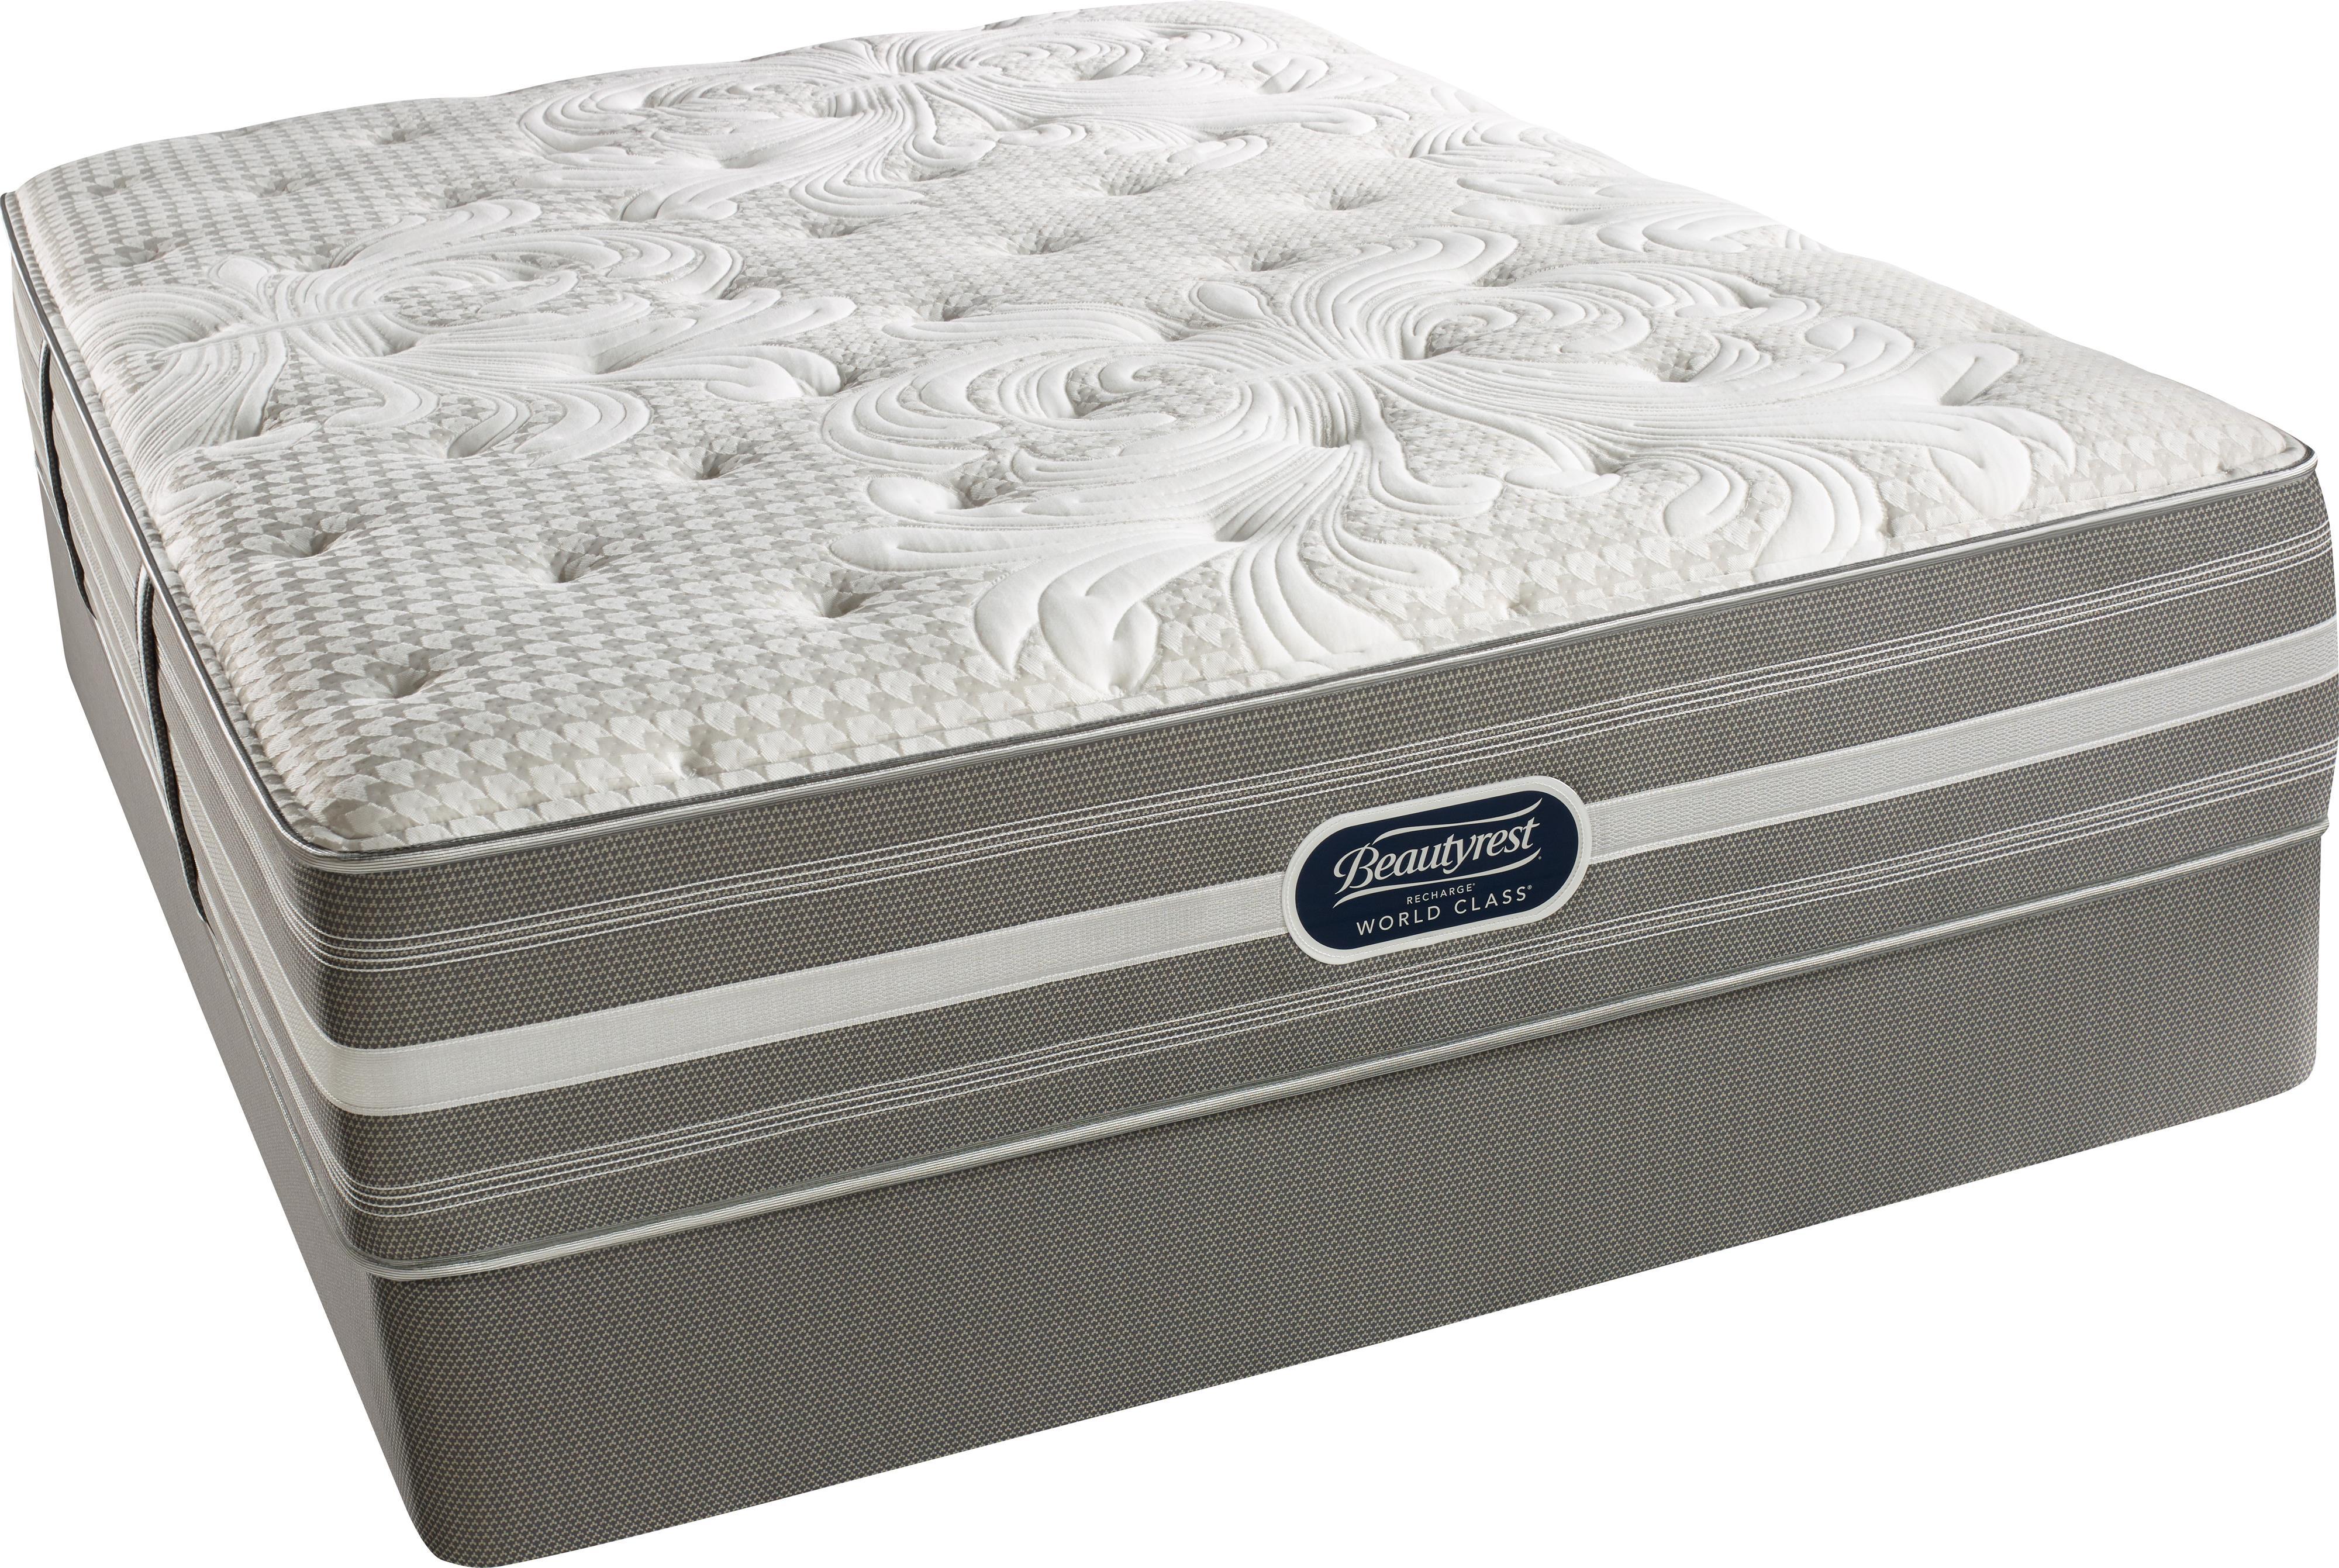 Simmons Bakerstand Twin Luxury Firm Mattress Set - Item Number: LuxuryFirm-T+50280T